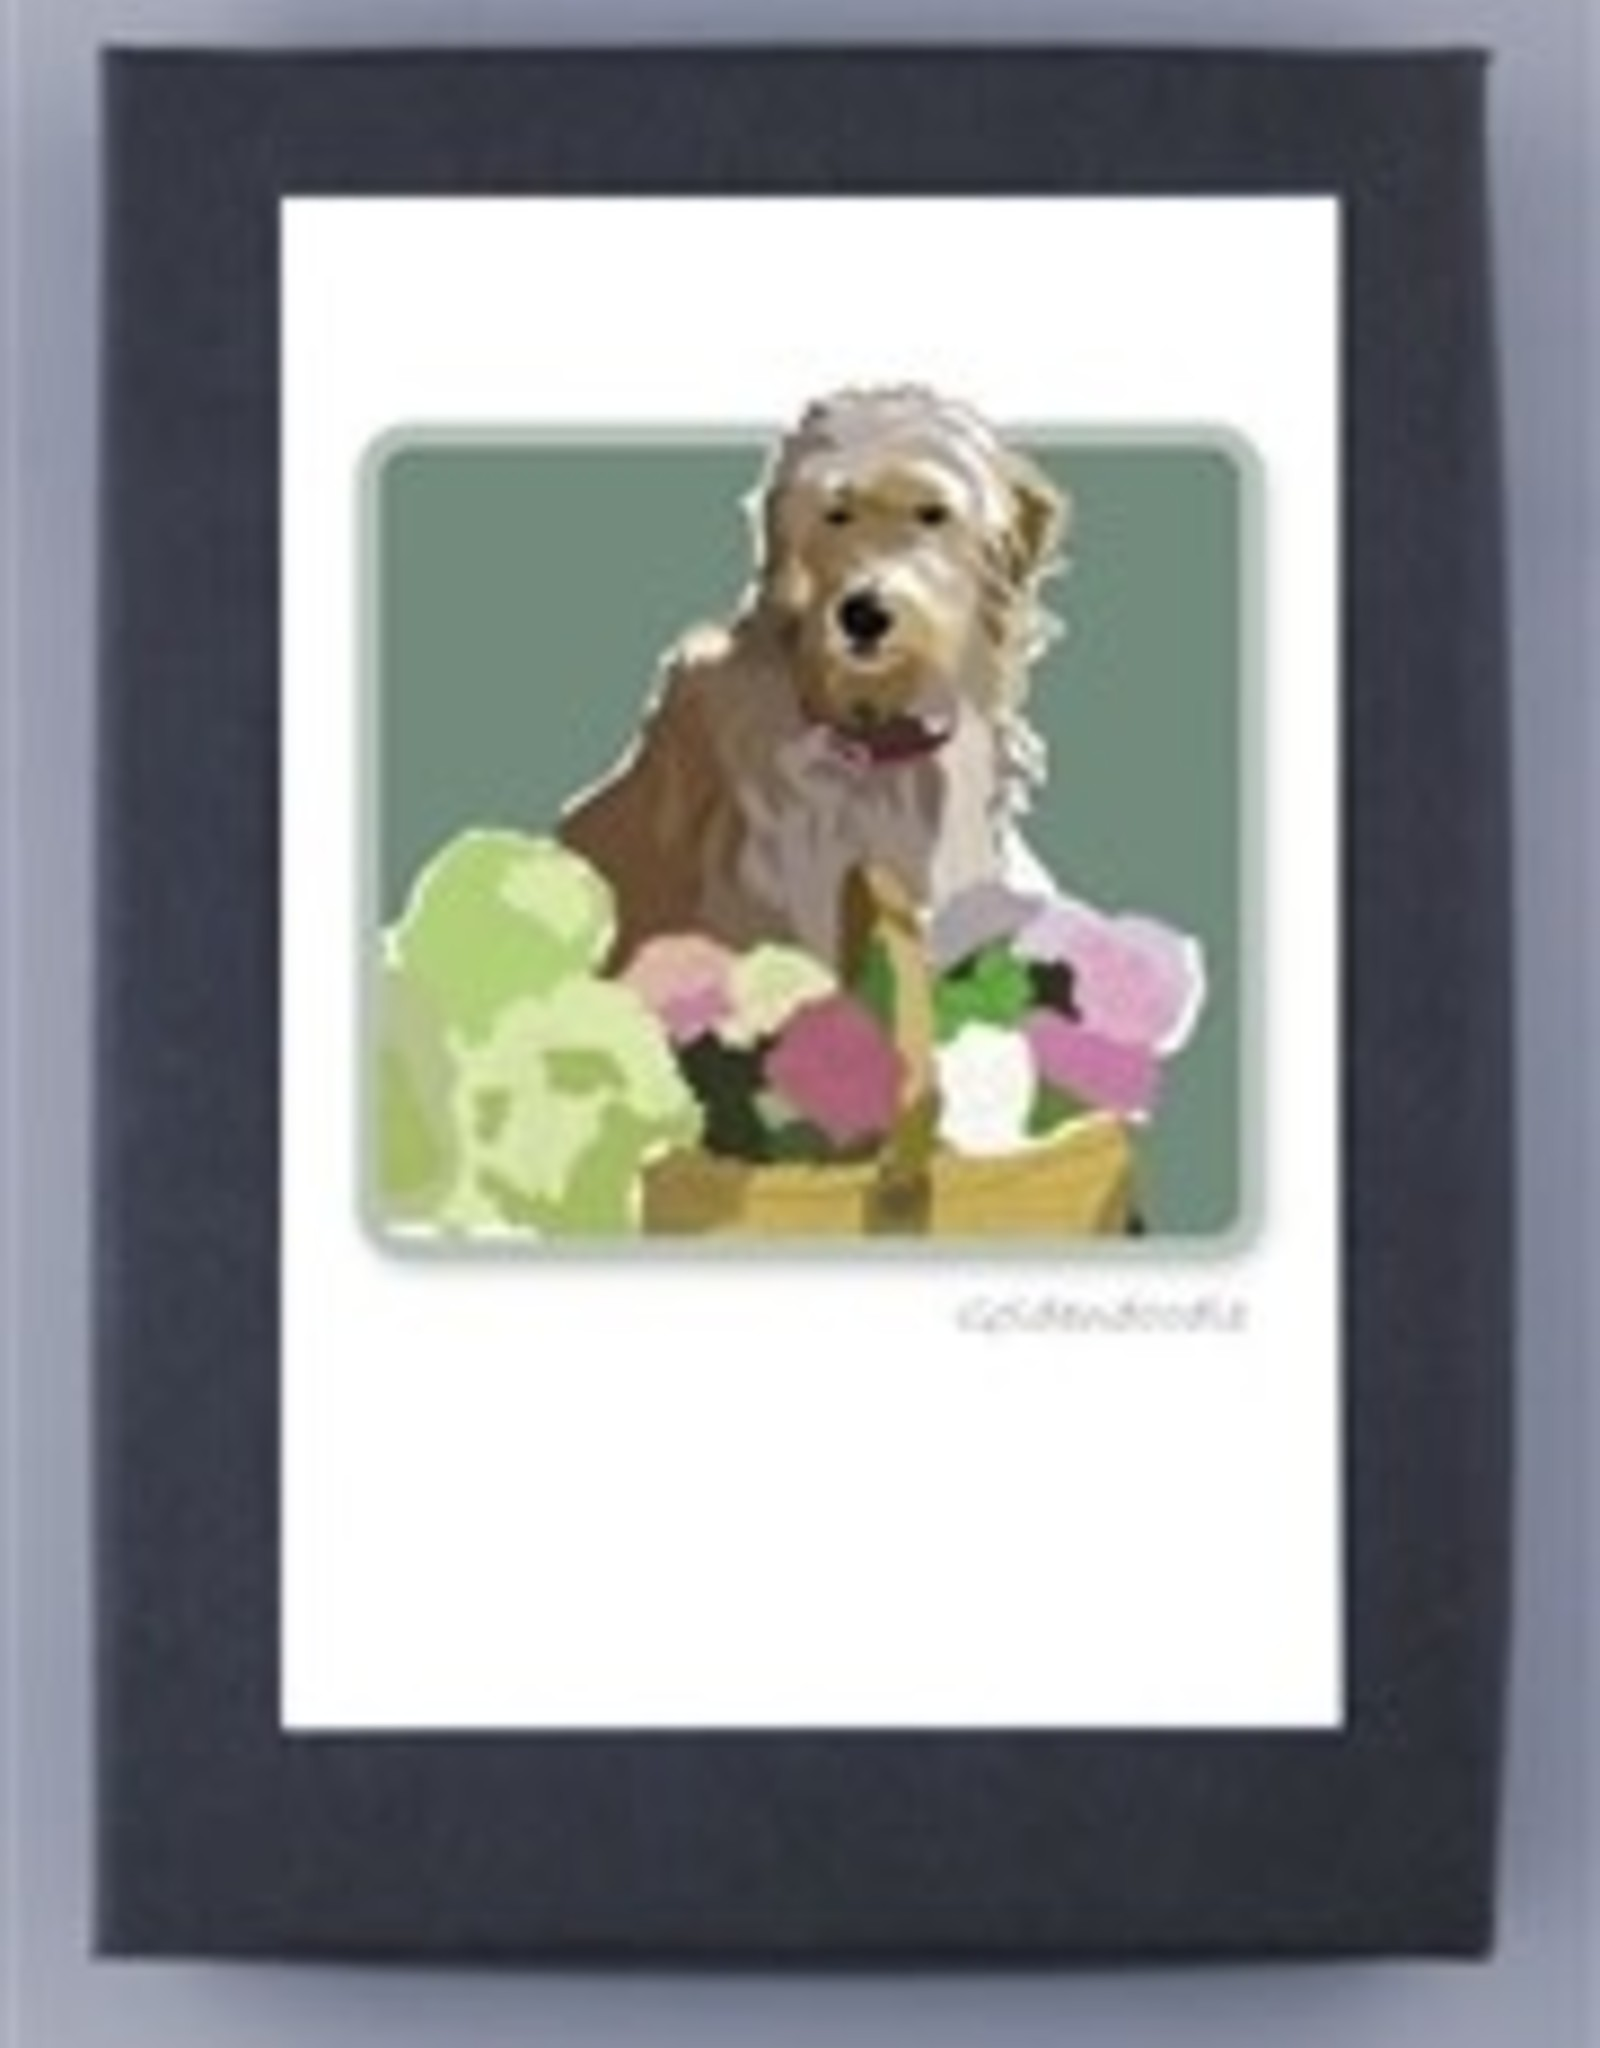 Paper Russells Goldendoodle